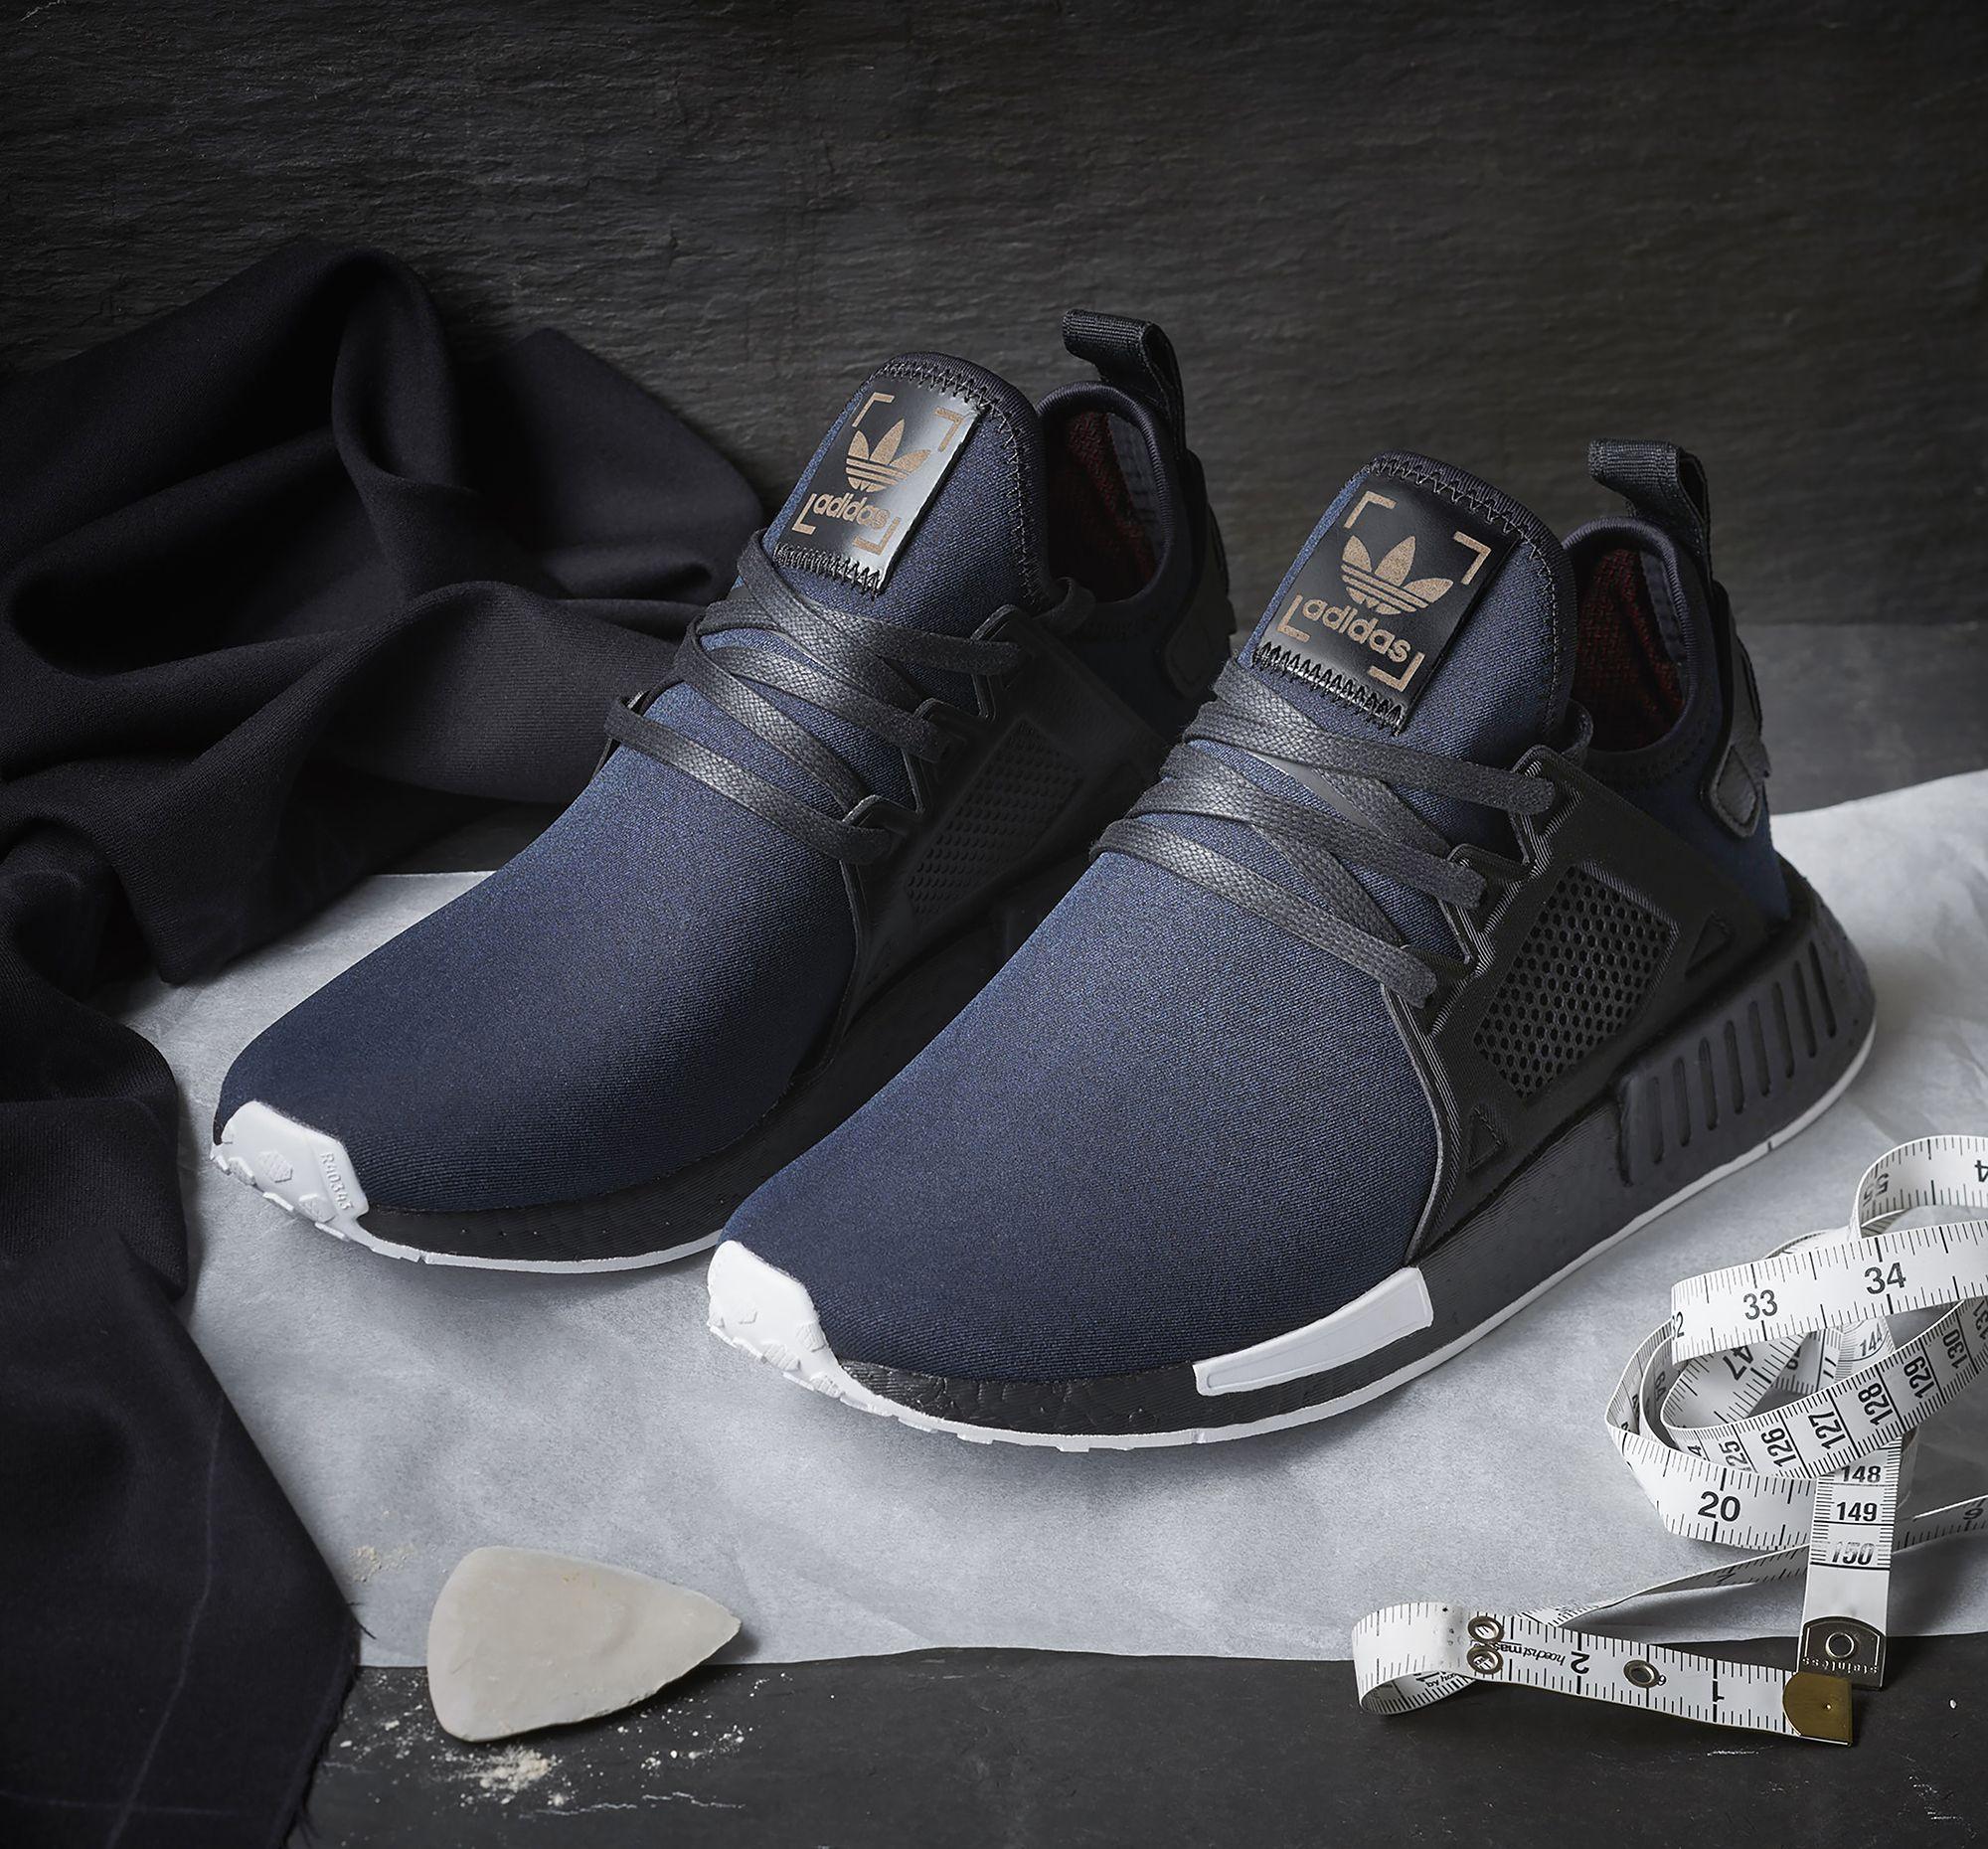 Adidas Originali - Nmd X Taglia?Henry Poole - Originali Raccolta Ue - X 9aacc4